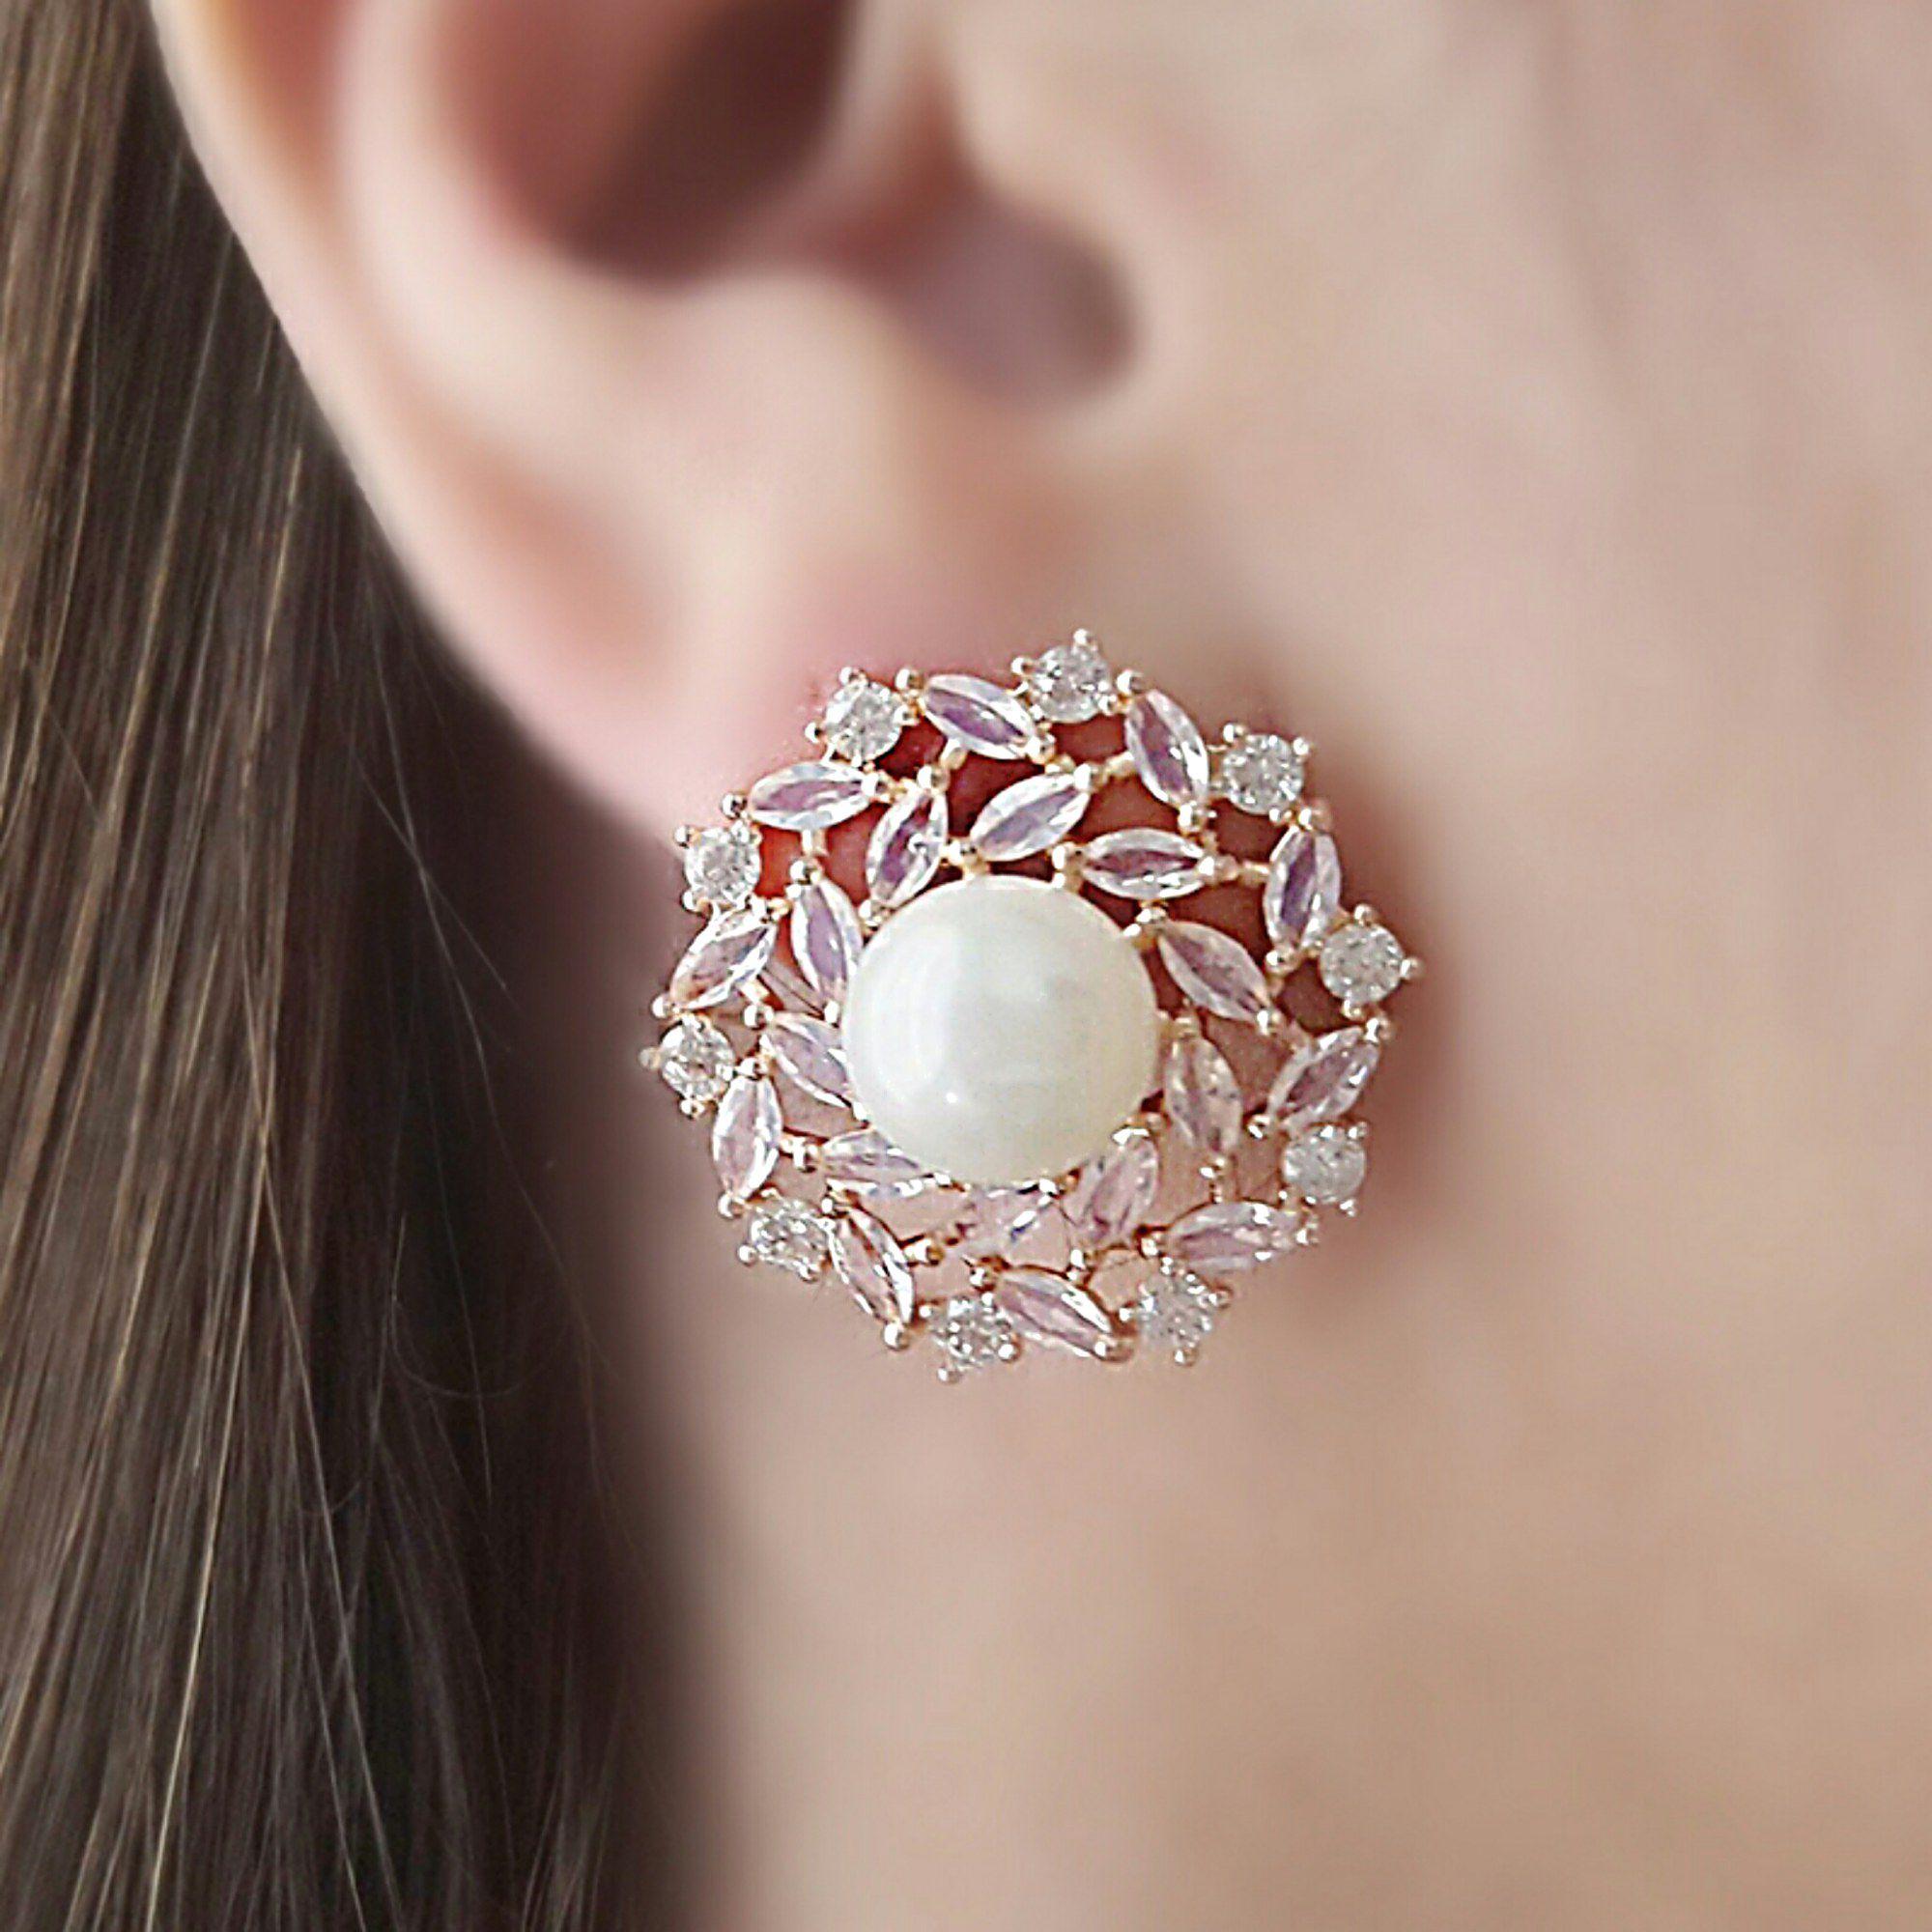 Brinco Pérola Noiva Semijoia Ouro Rosé Zircônia Branca e Cristal Rosa  - Soloyou